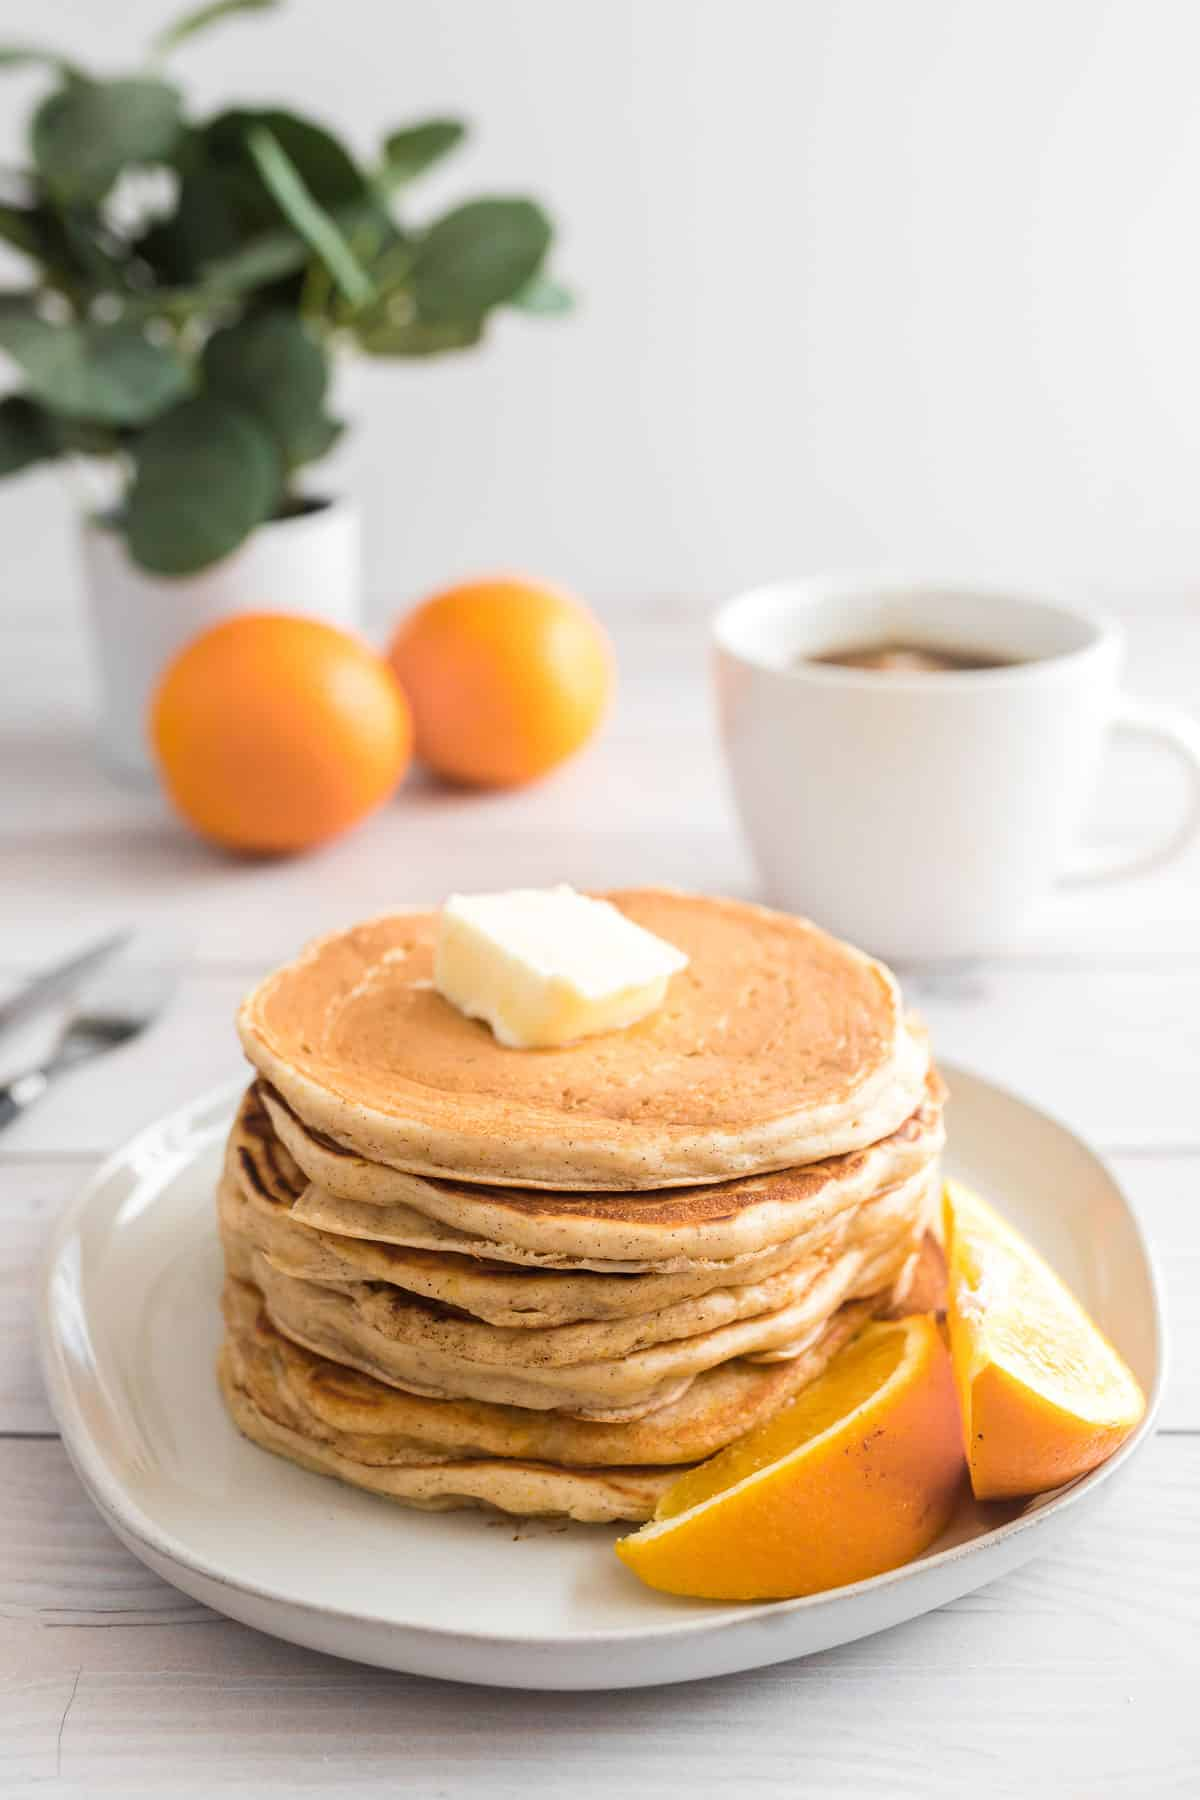 Stack of orange buttermilk pancakes.